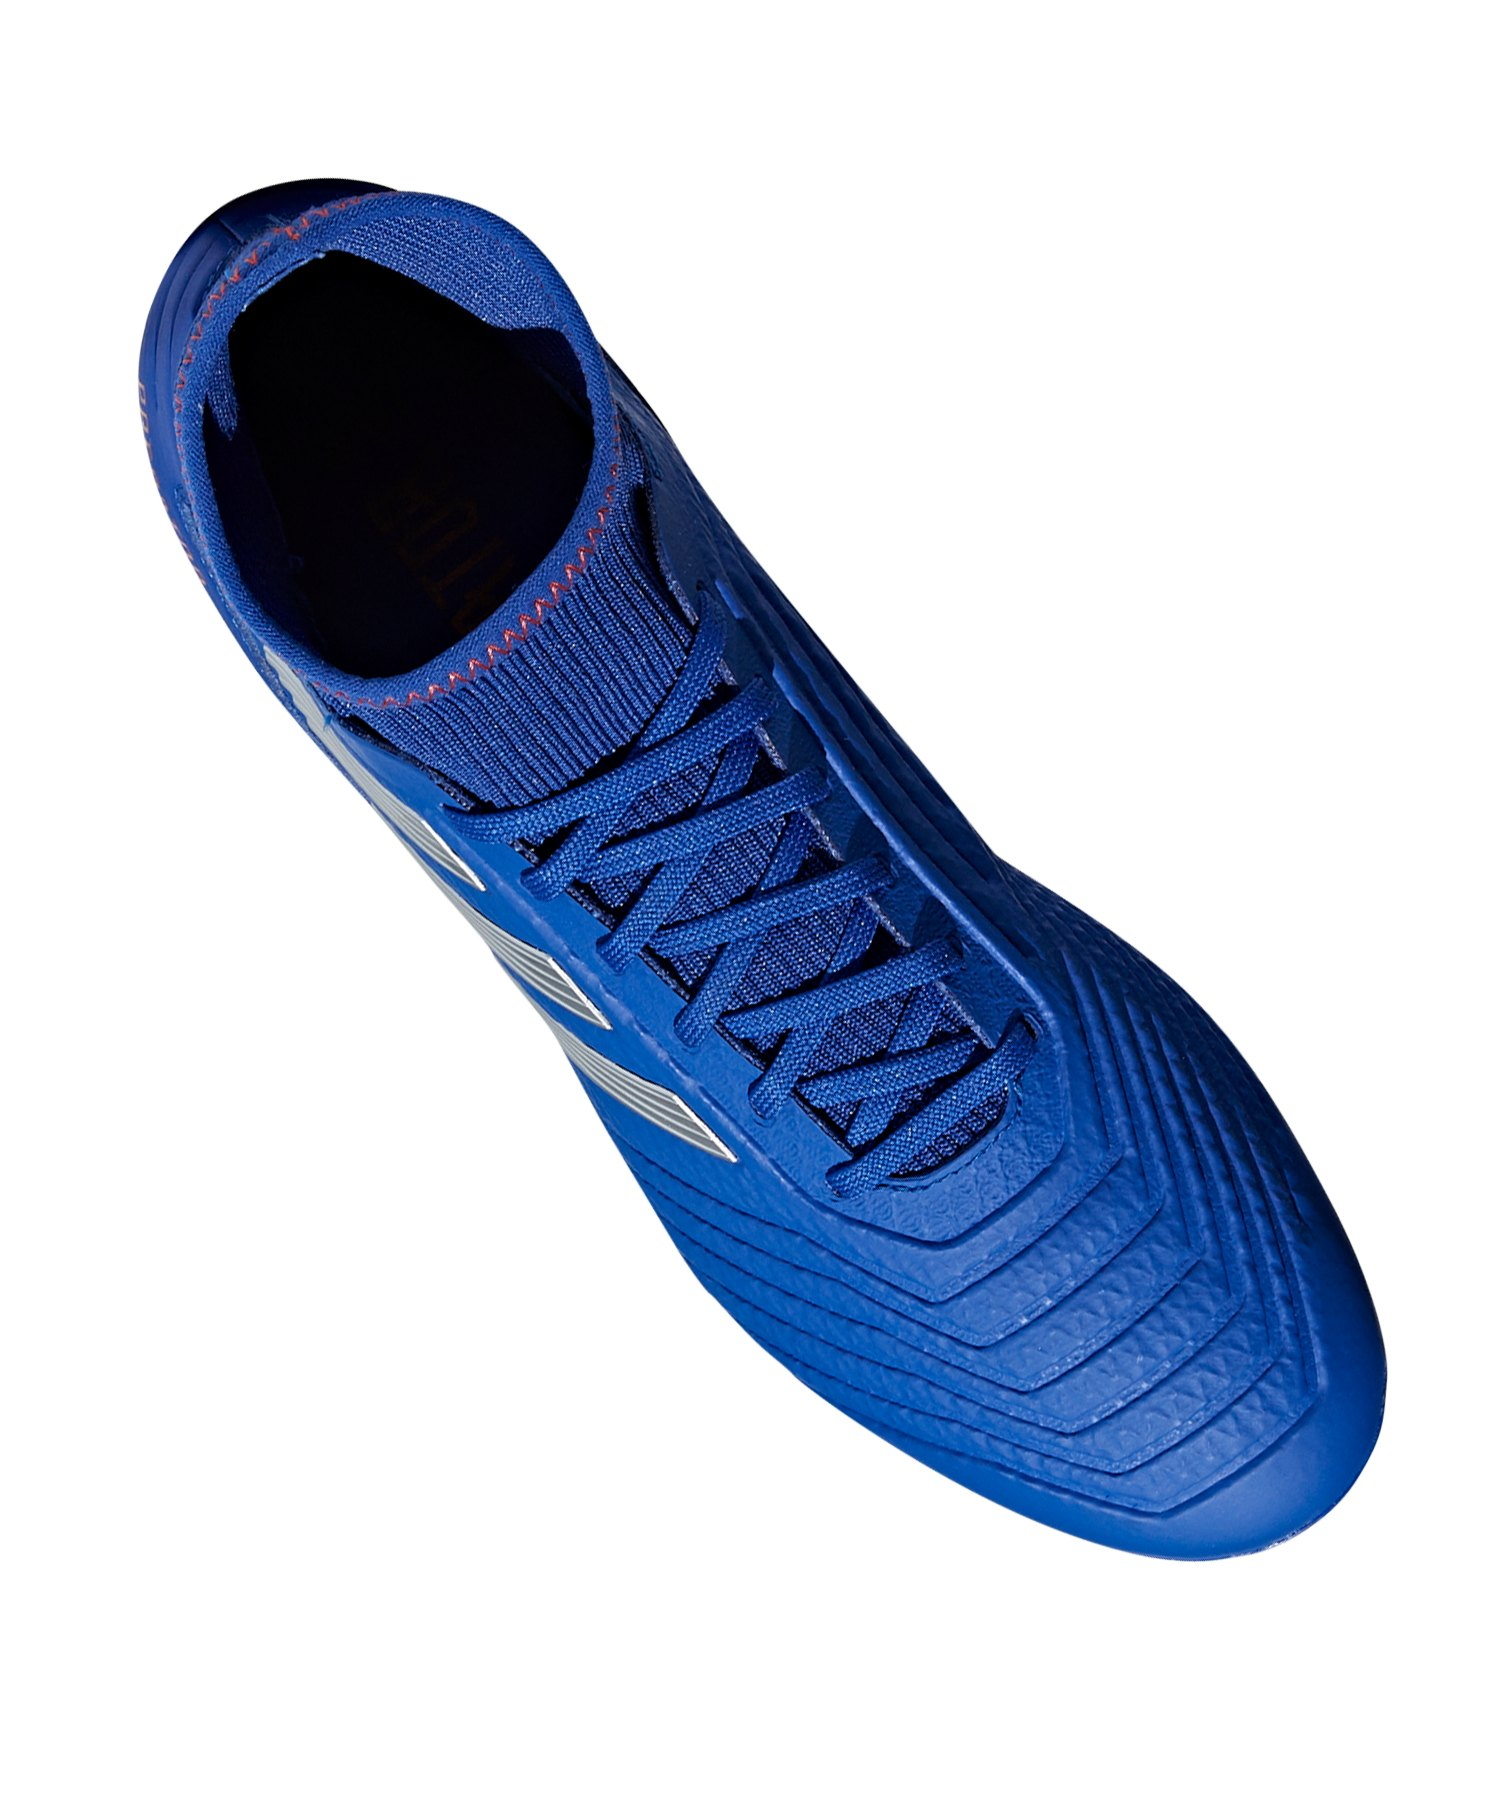 adidas Predator 19.3 AG blau silber rot